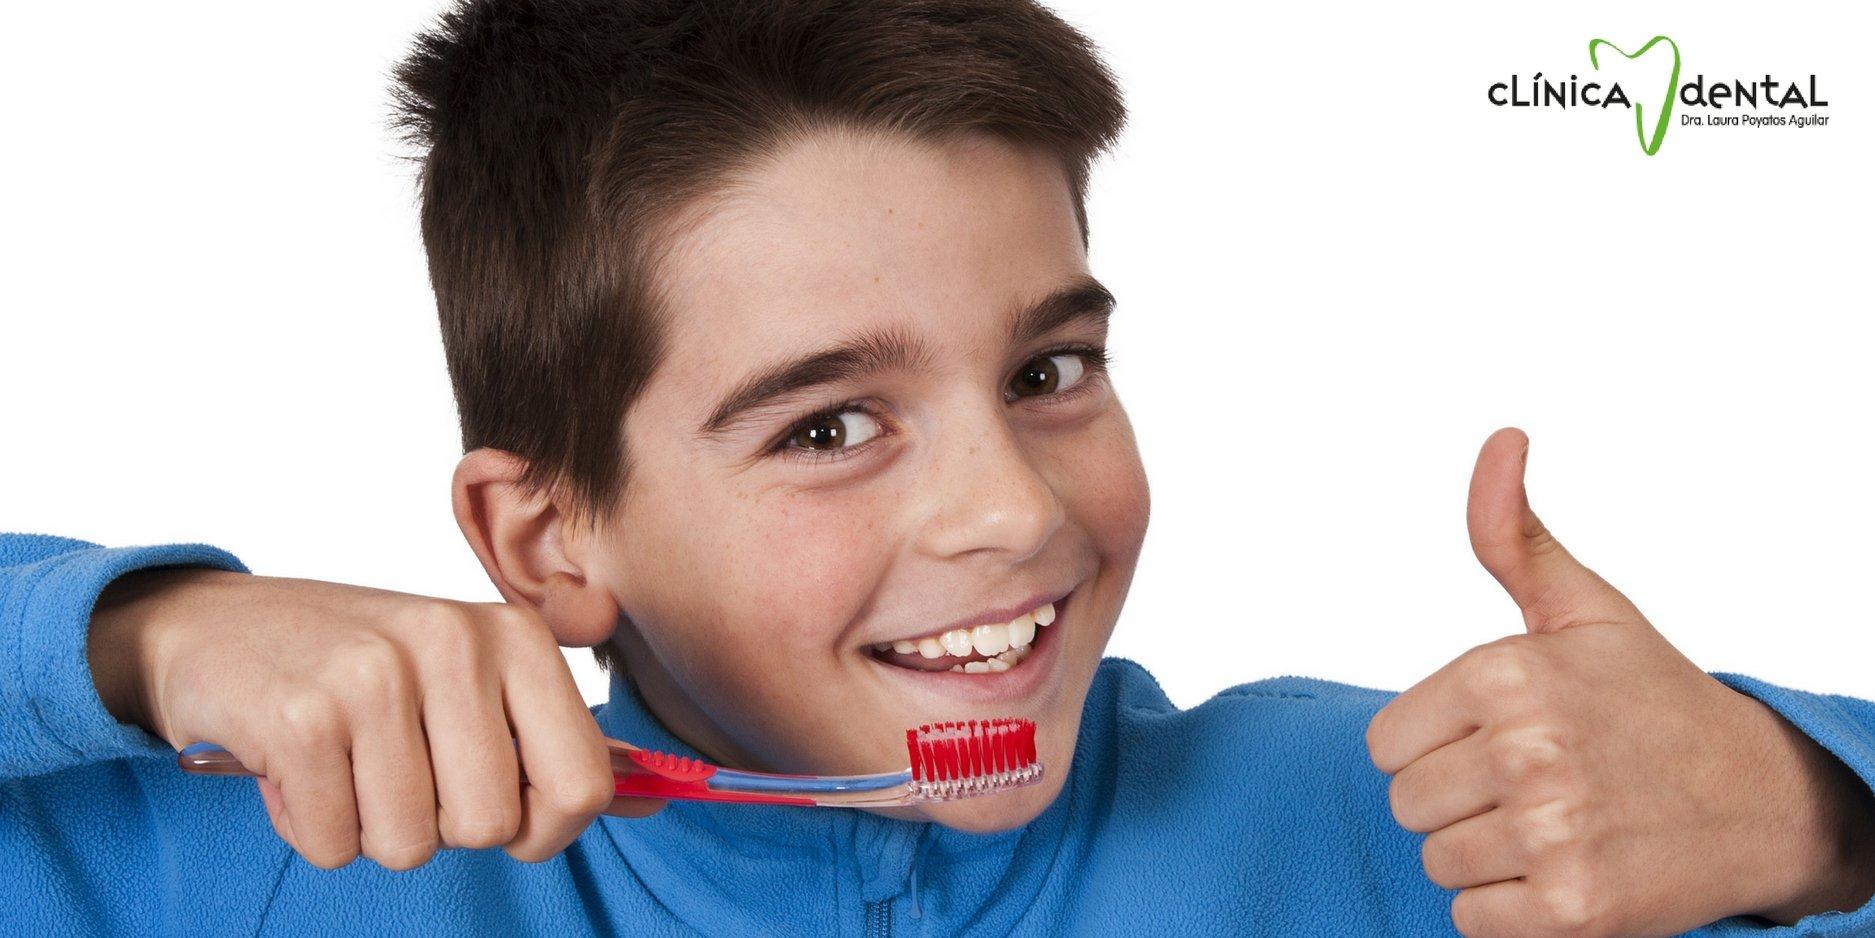 imagen portada dientes de leche